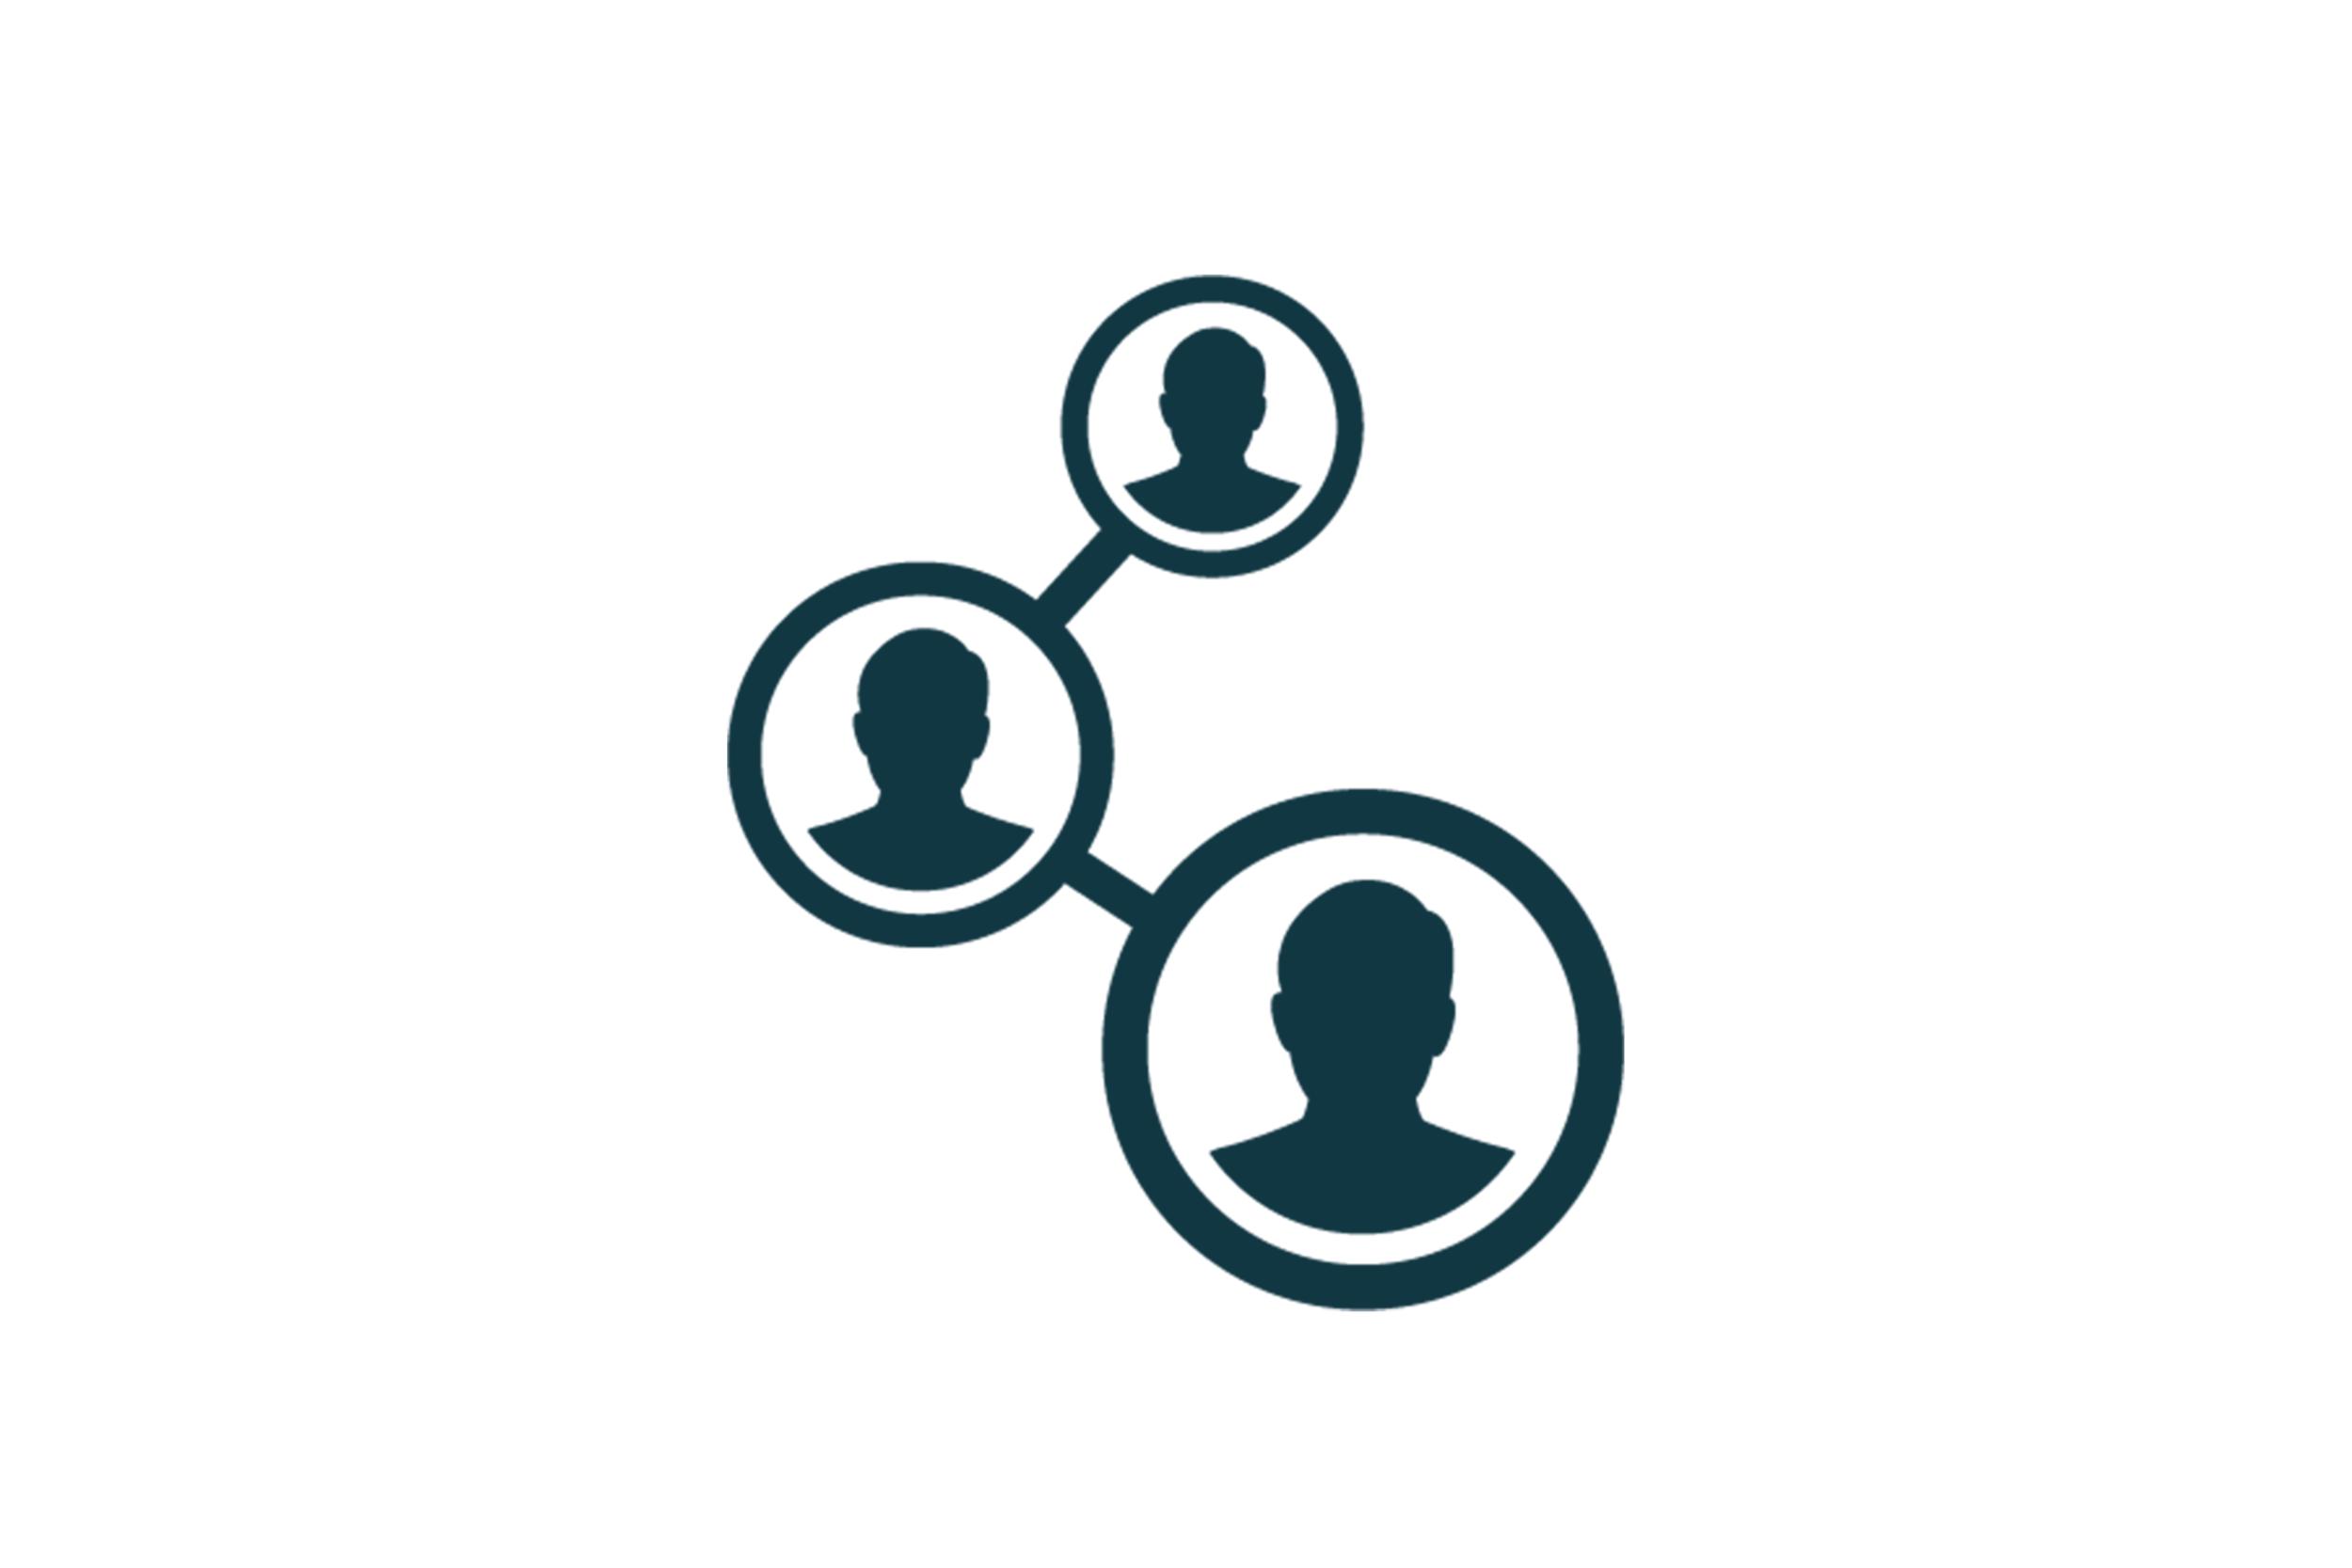 Community management Facebook, Instagram, Twitter, LinkedIn